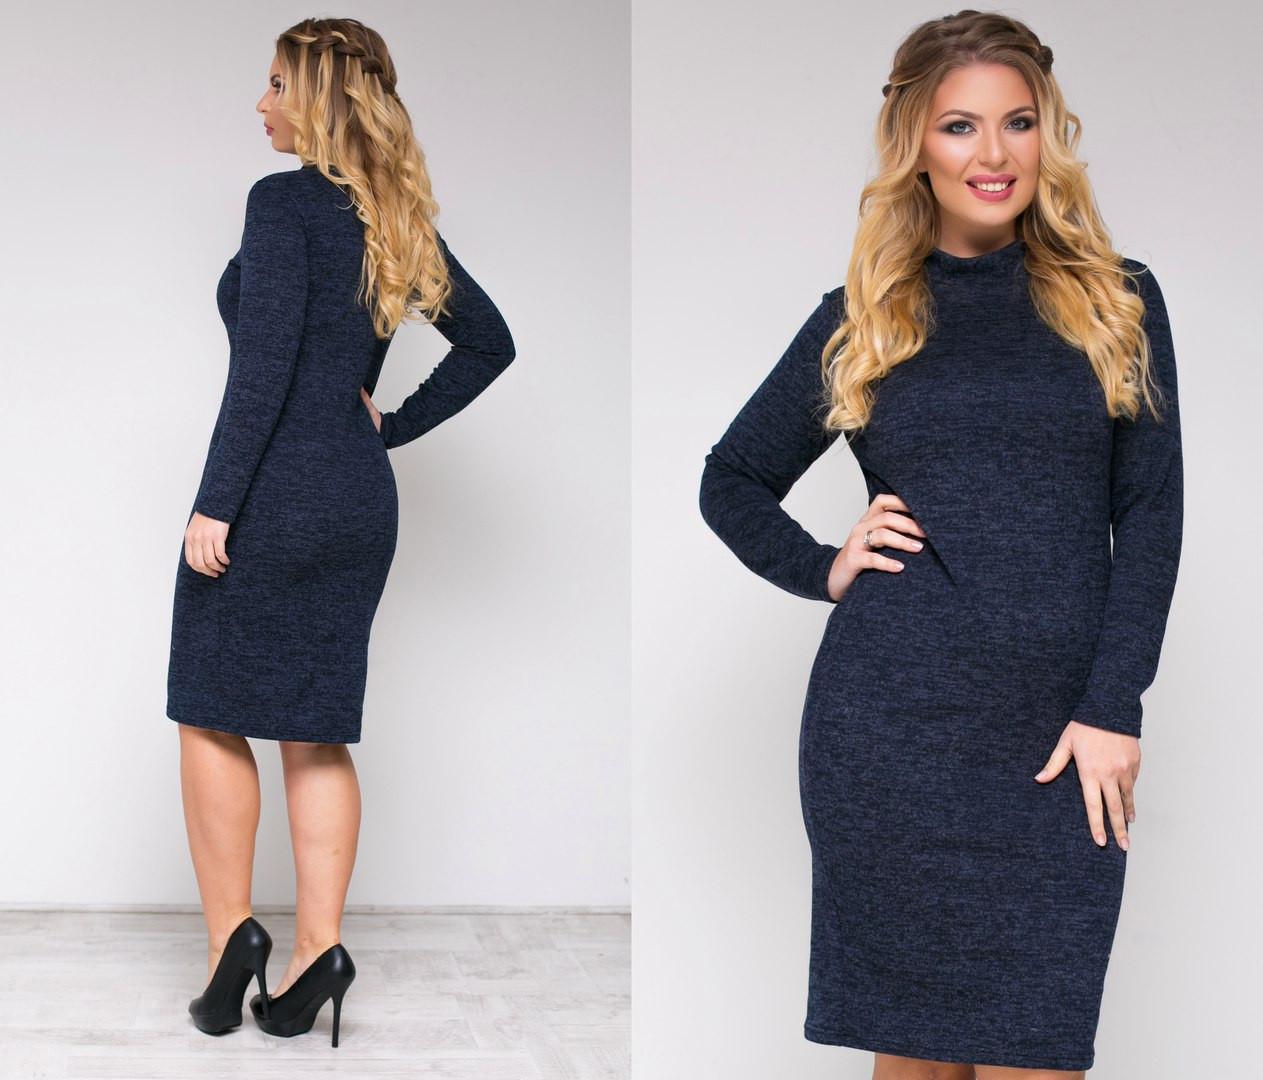 Теплое платье Миди с горлом Батал Темно-синий